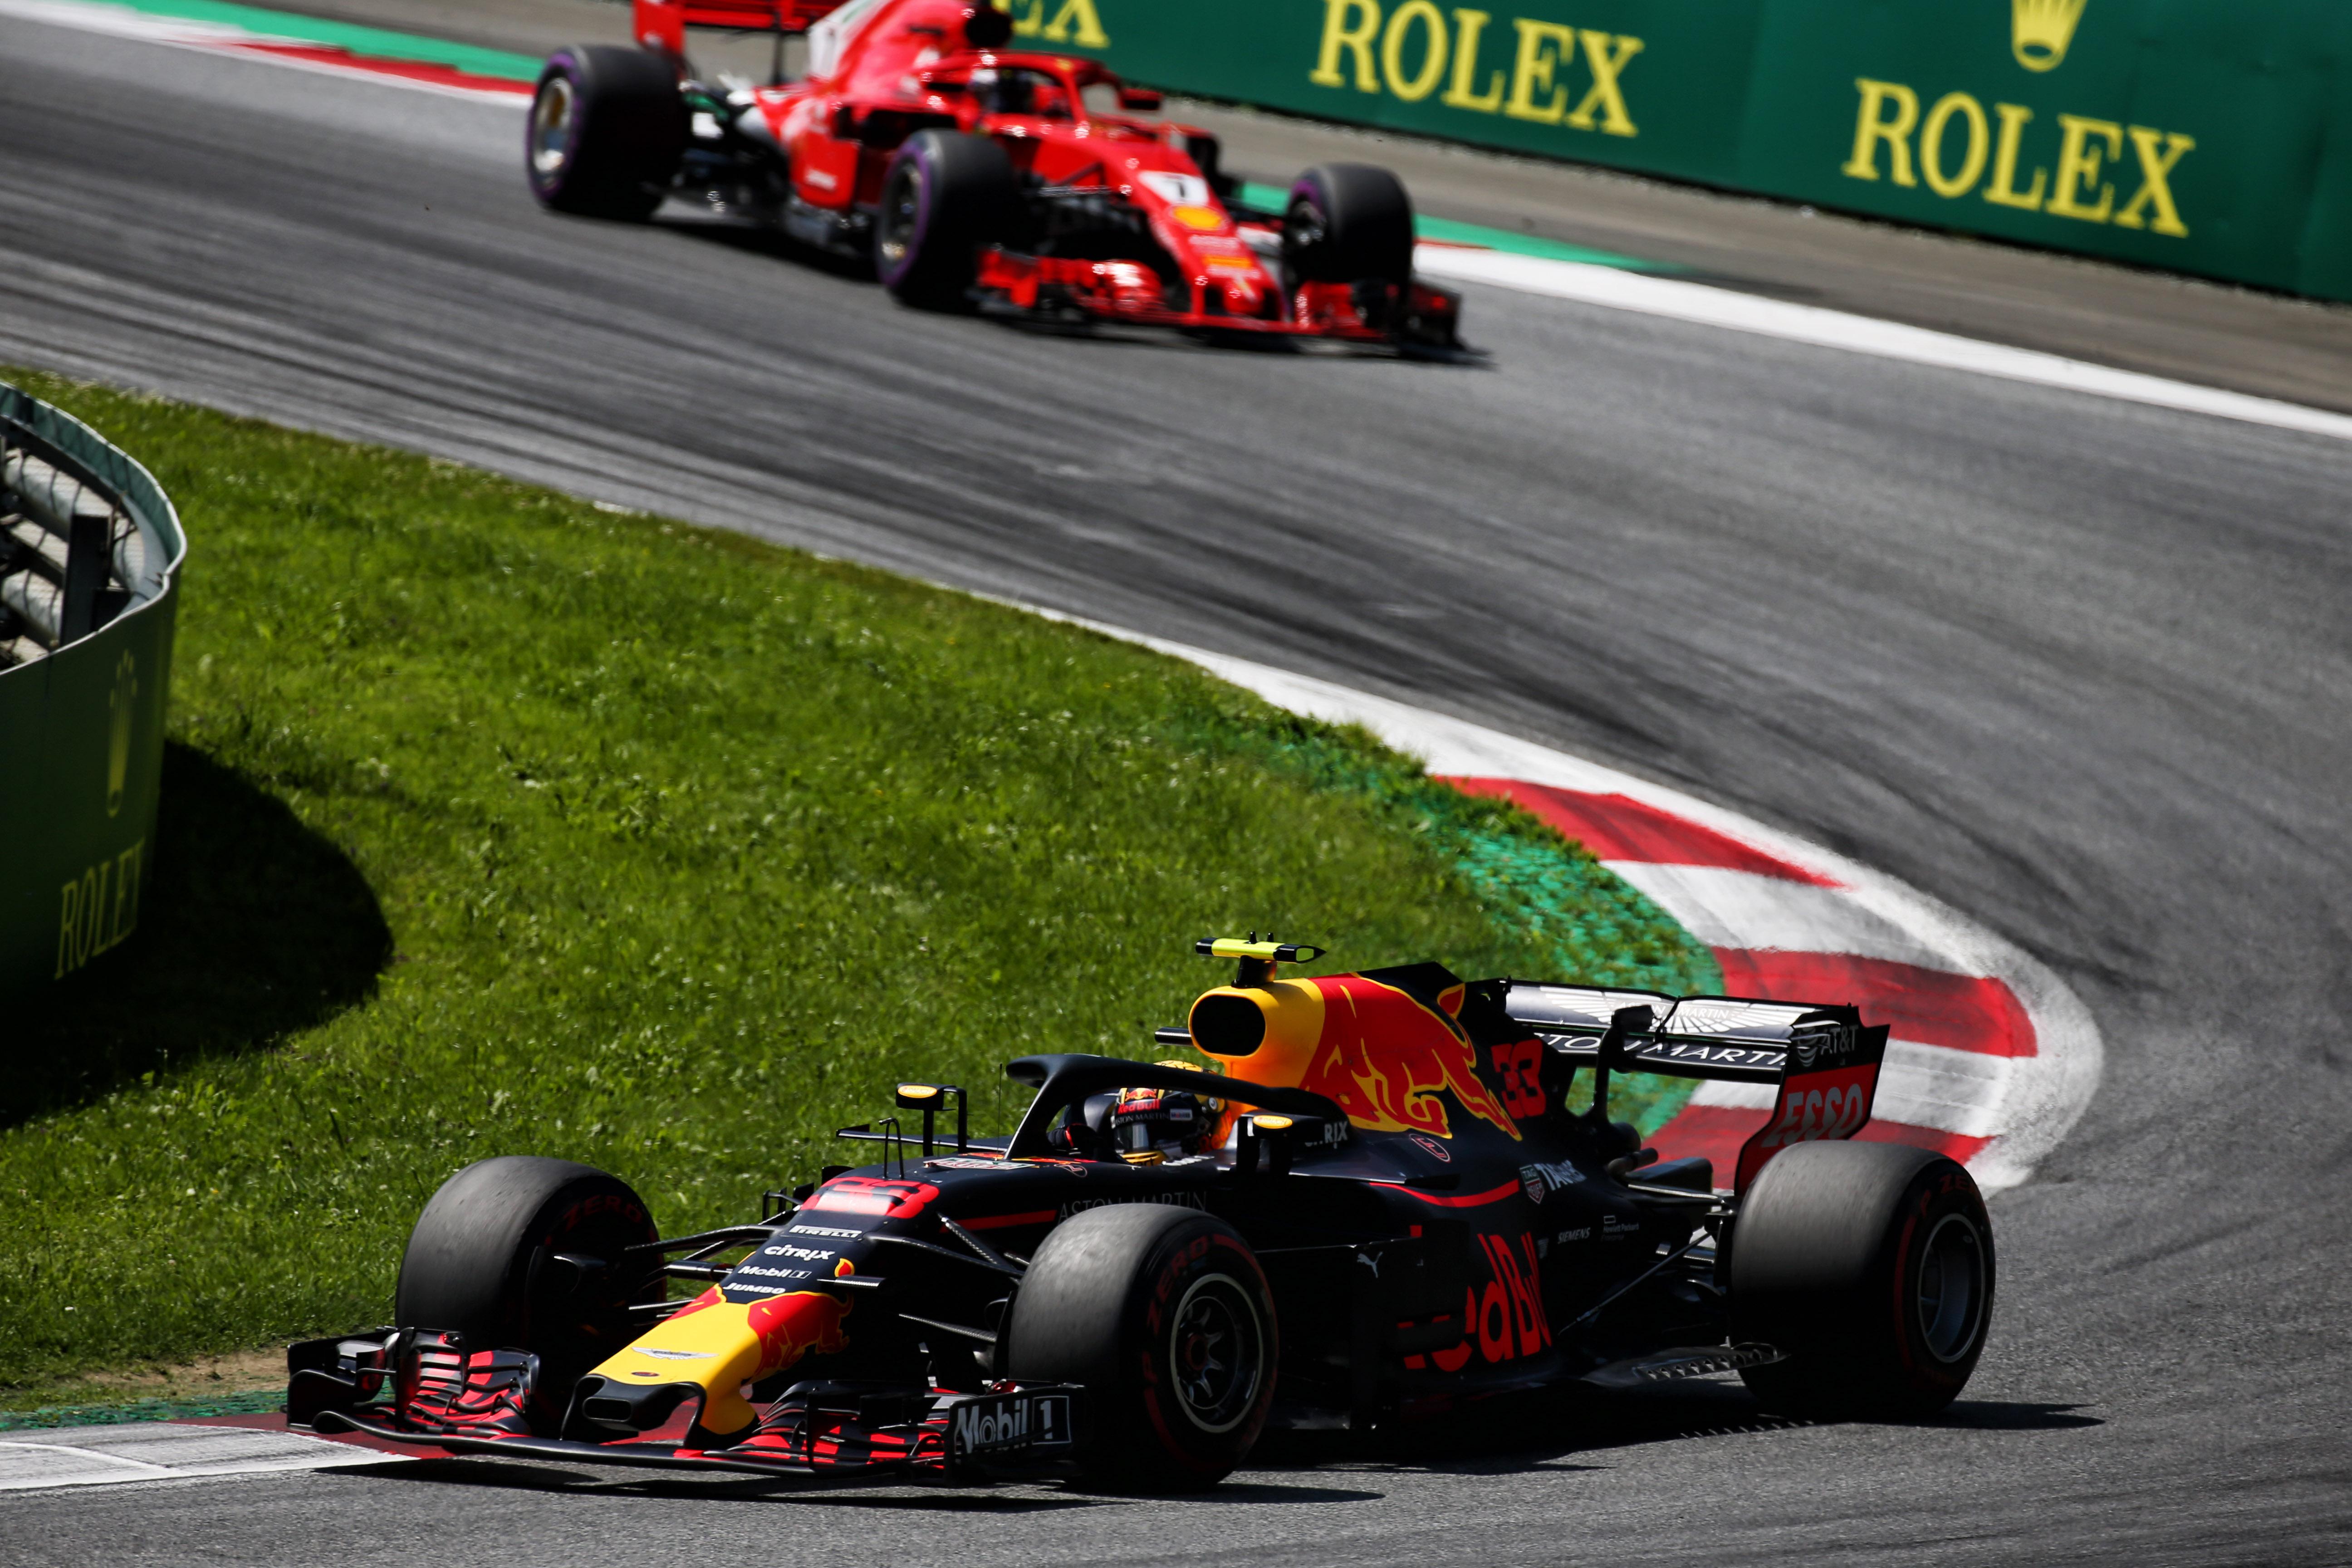 Max Verstappen Red Bull Austrian Grand Prix 2018